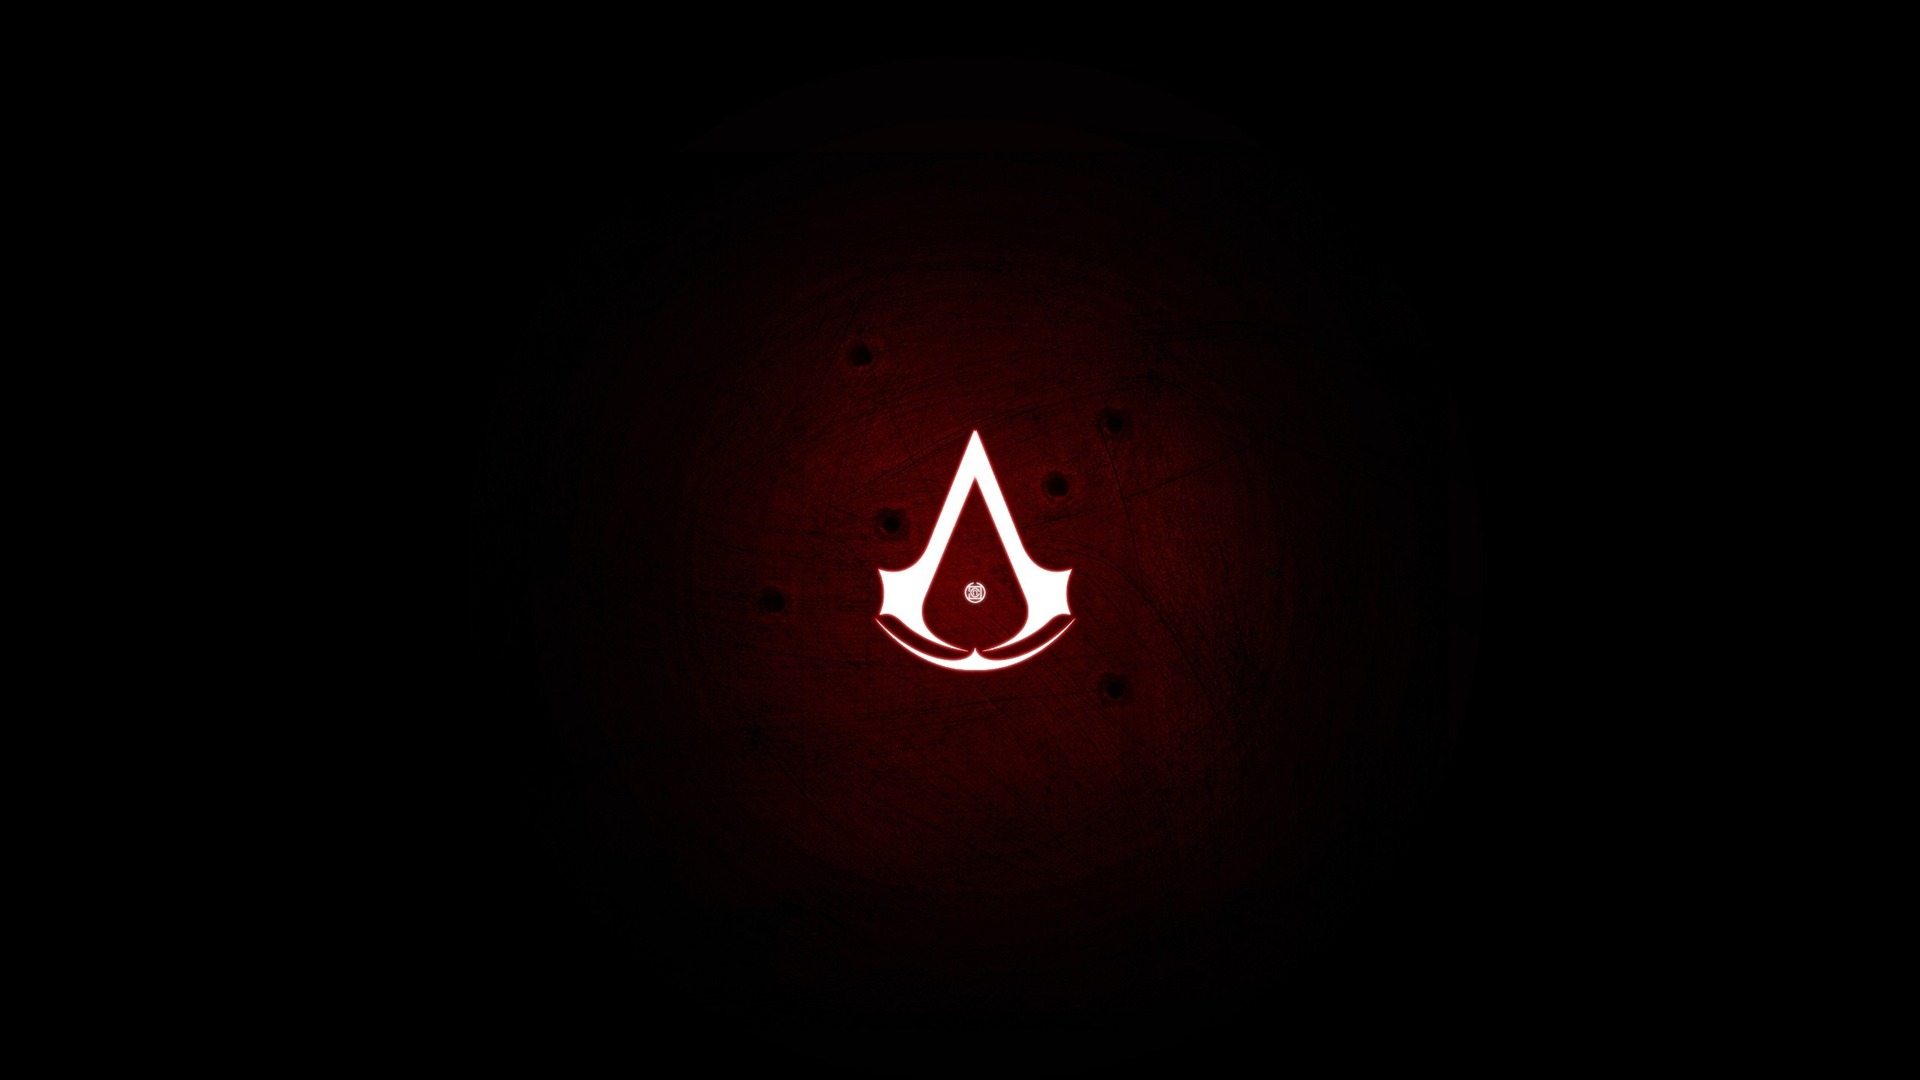 Assassin Creed Brotherhood Game Wallpaper 16 Preview 10wallpaper Com